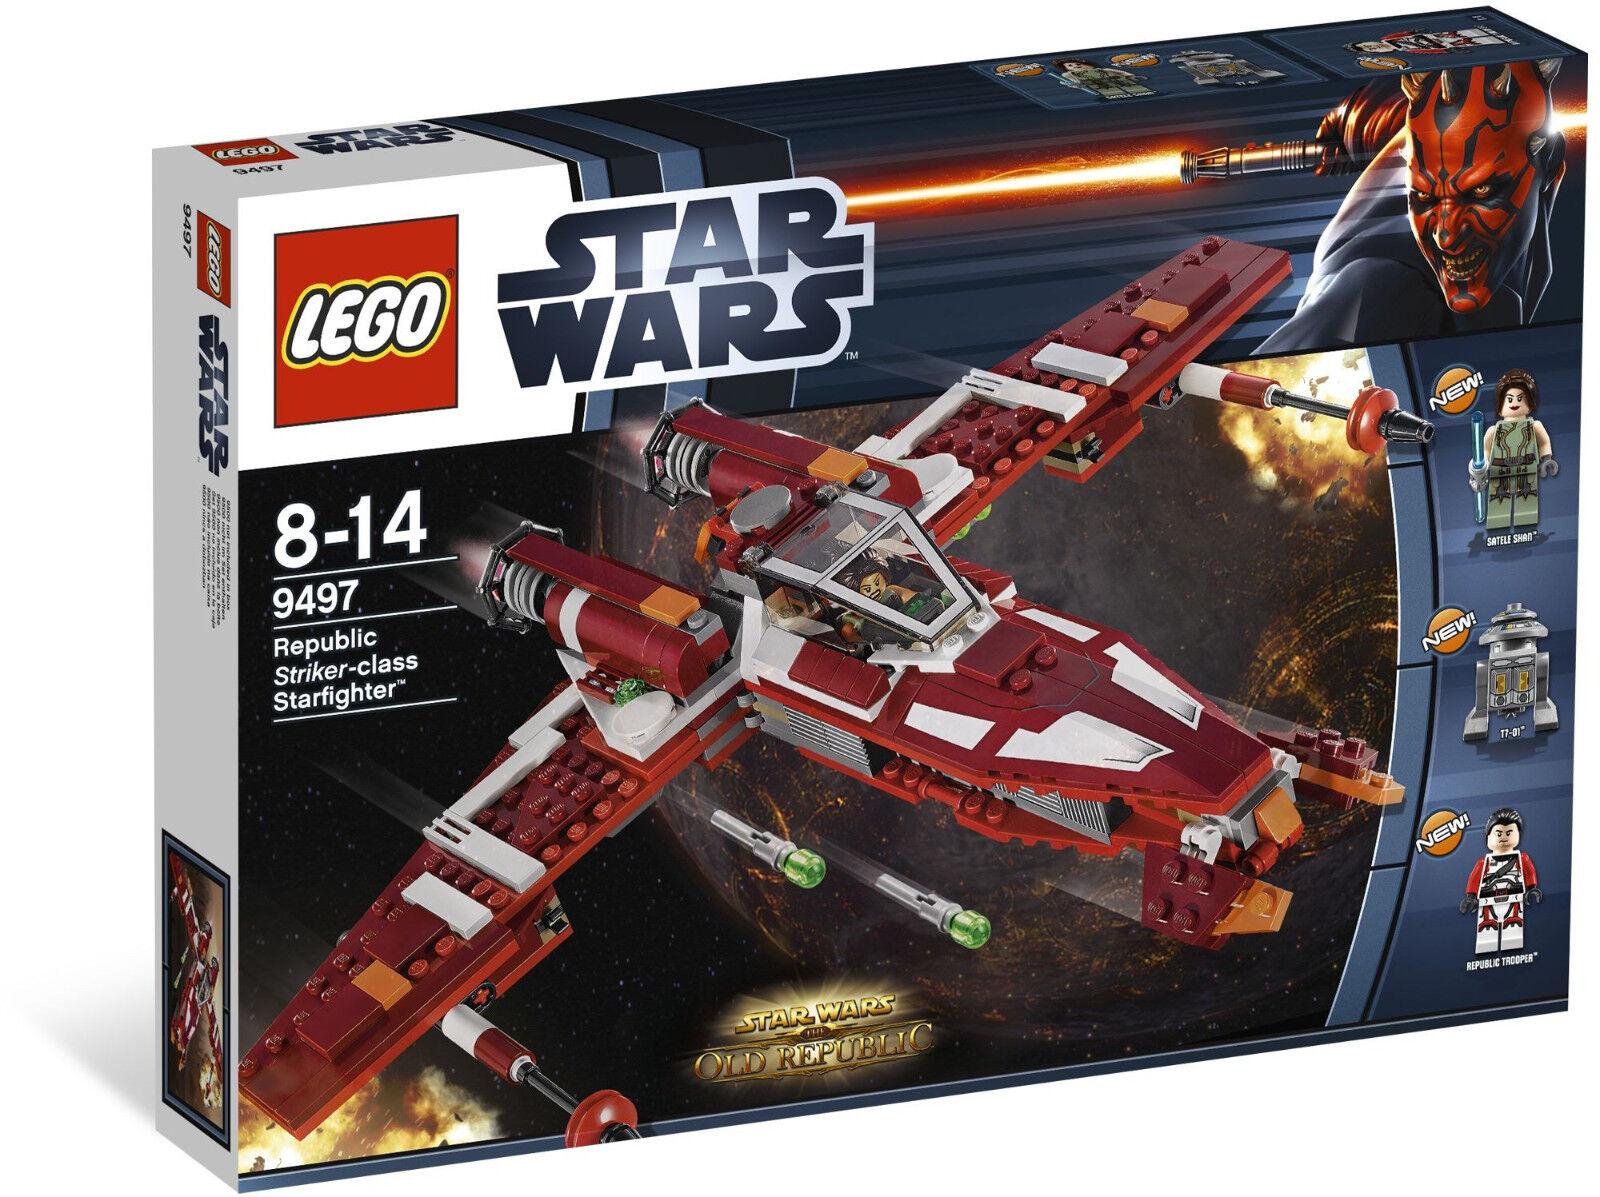 LEGO Star Wars 9497 Republic Striker-class Starfighter, NEW Discontinued 2012